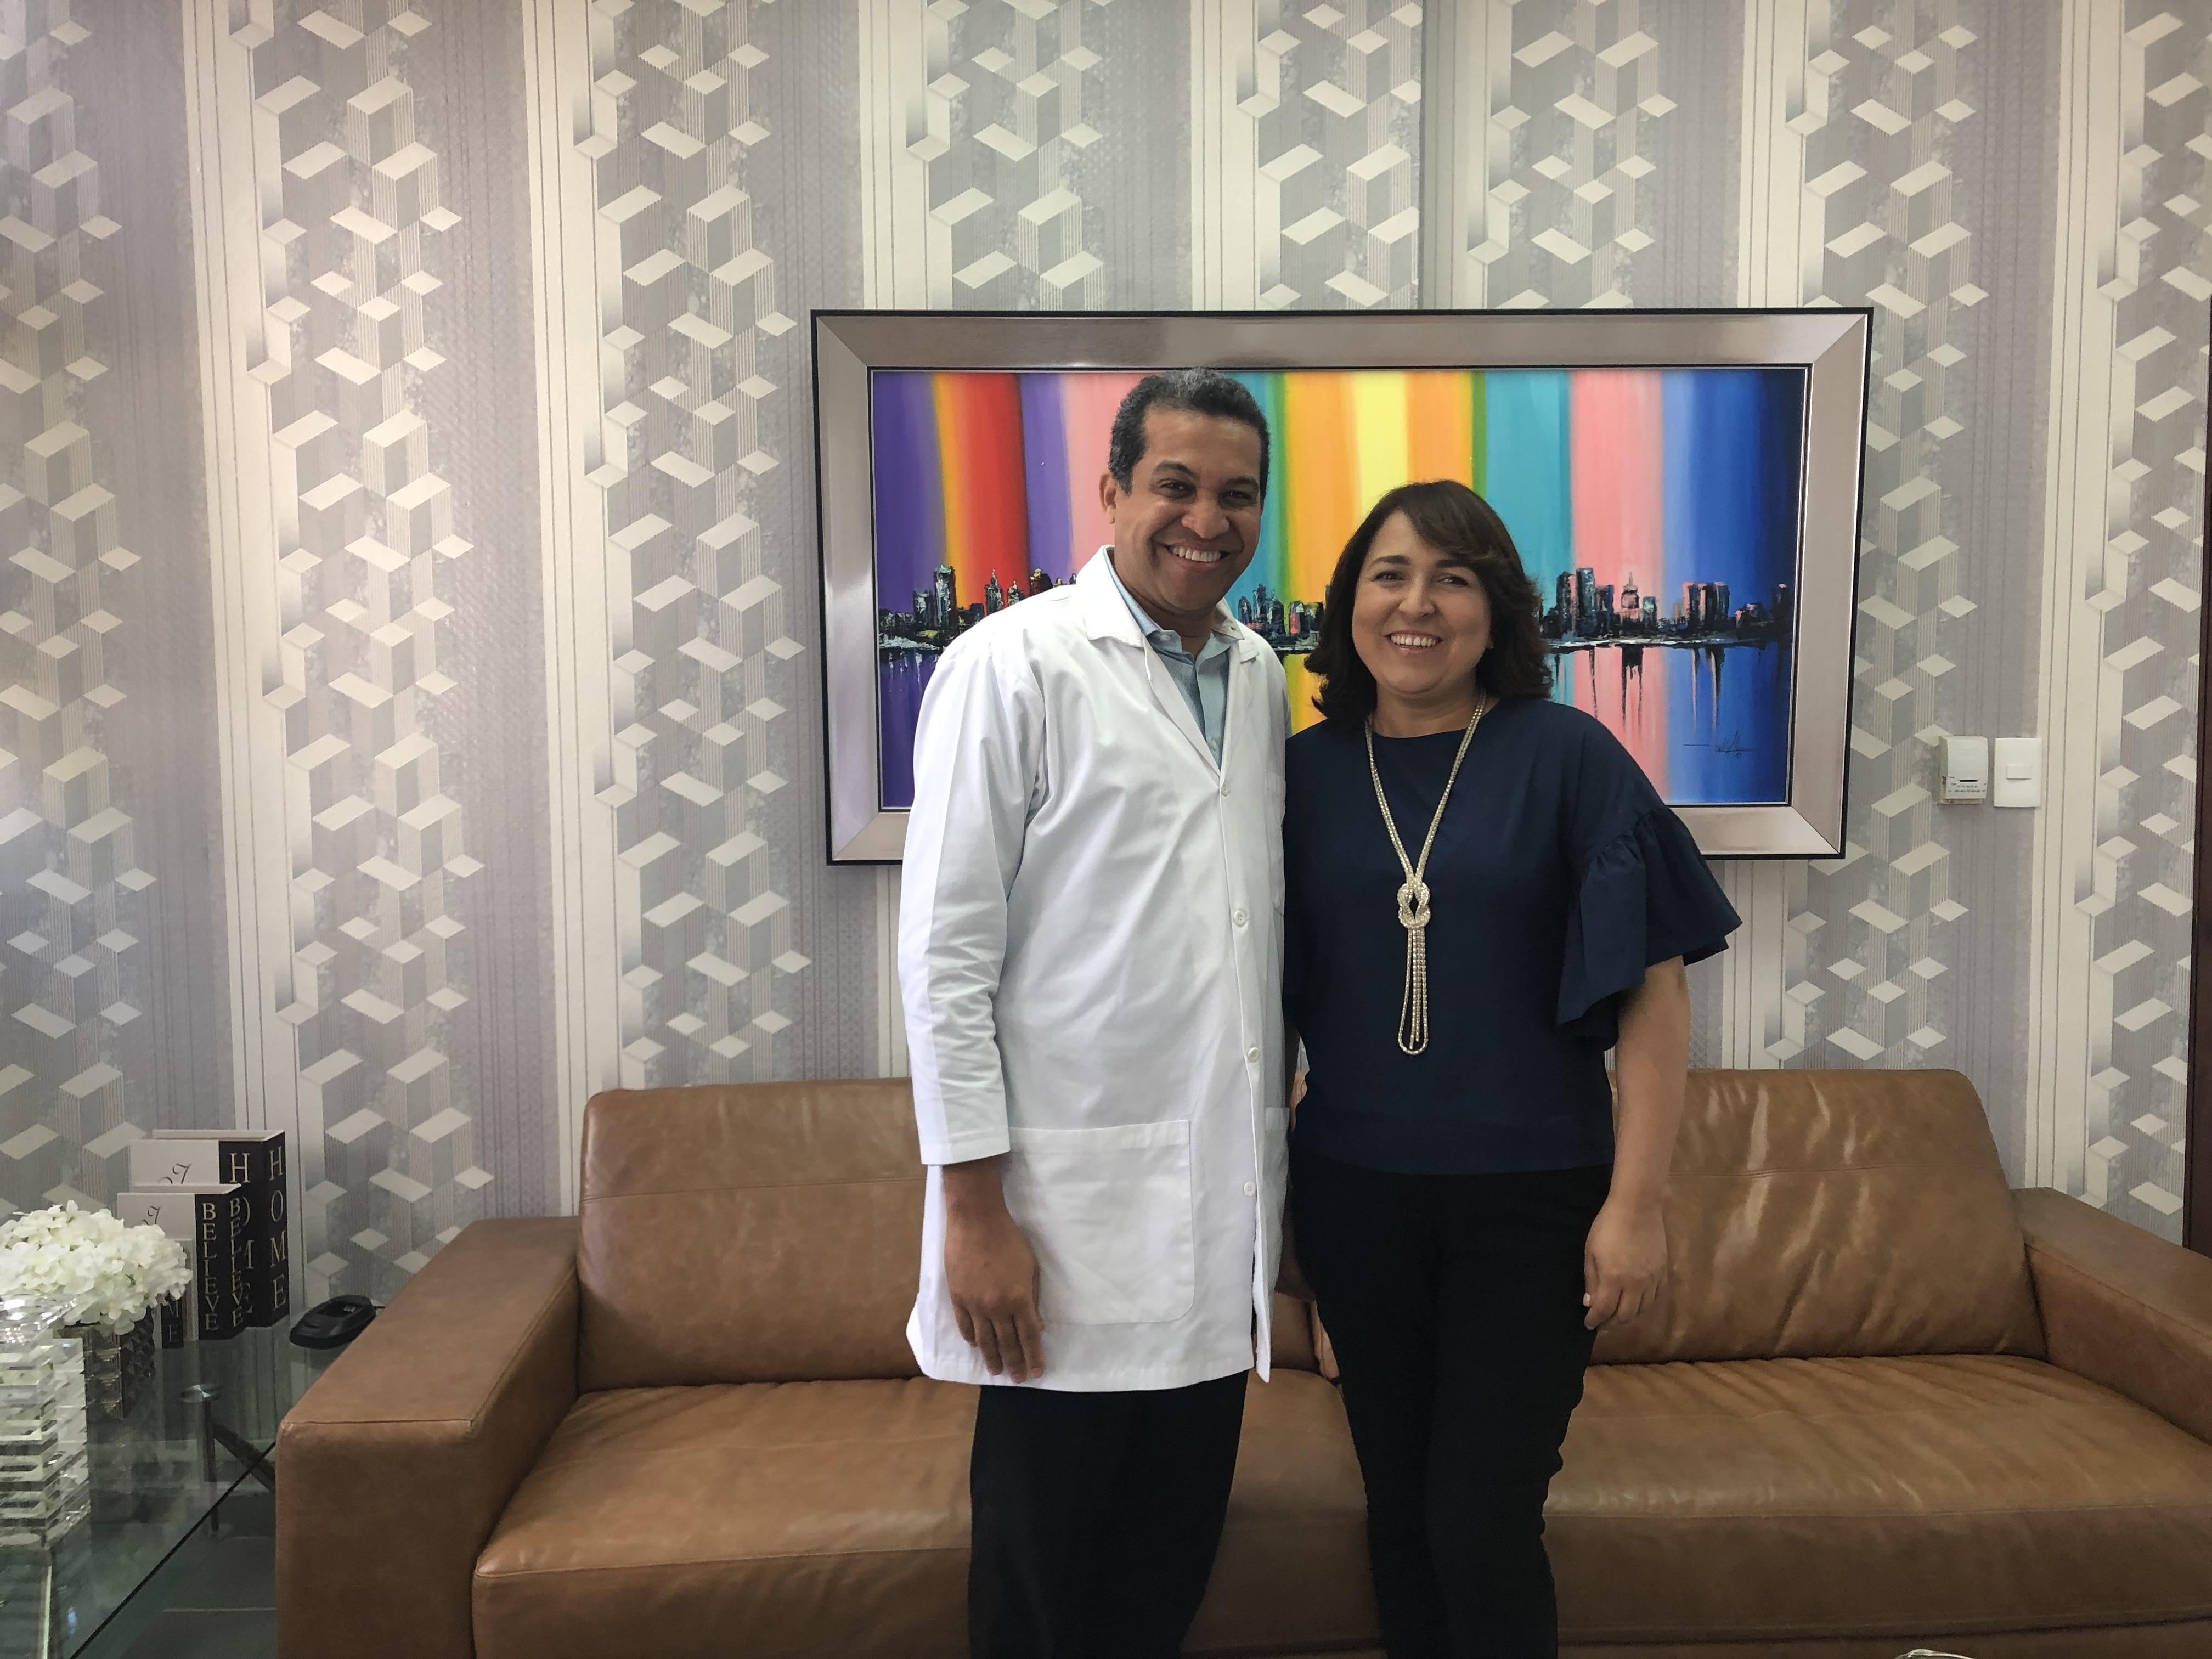 La presidente de Acroarte visita el Hospital Vinicio Calventi